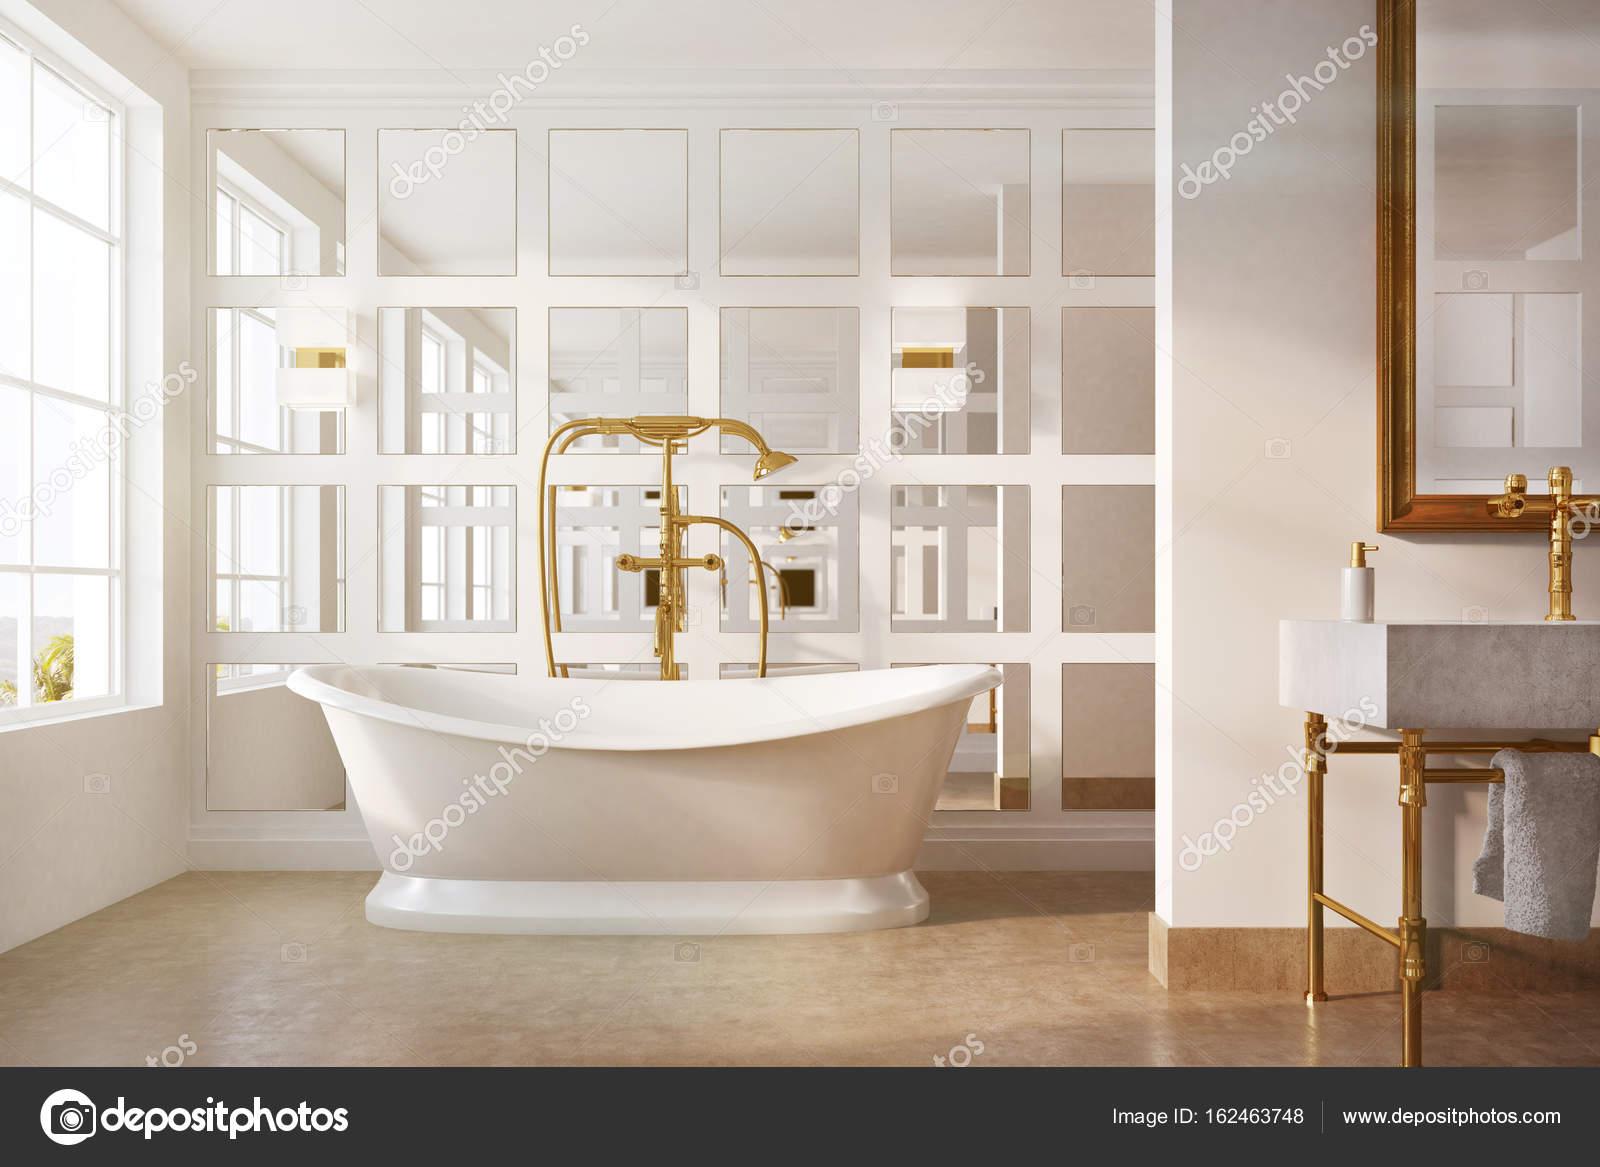 Vasche Da Bagno Vintage Prezzi : Bagno vintage vasca bianca specchio tonico u2014 foto stock